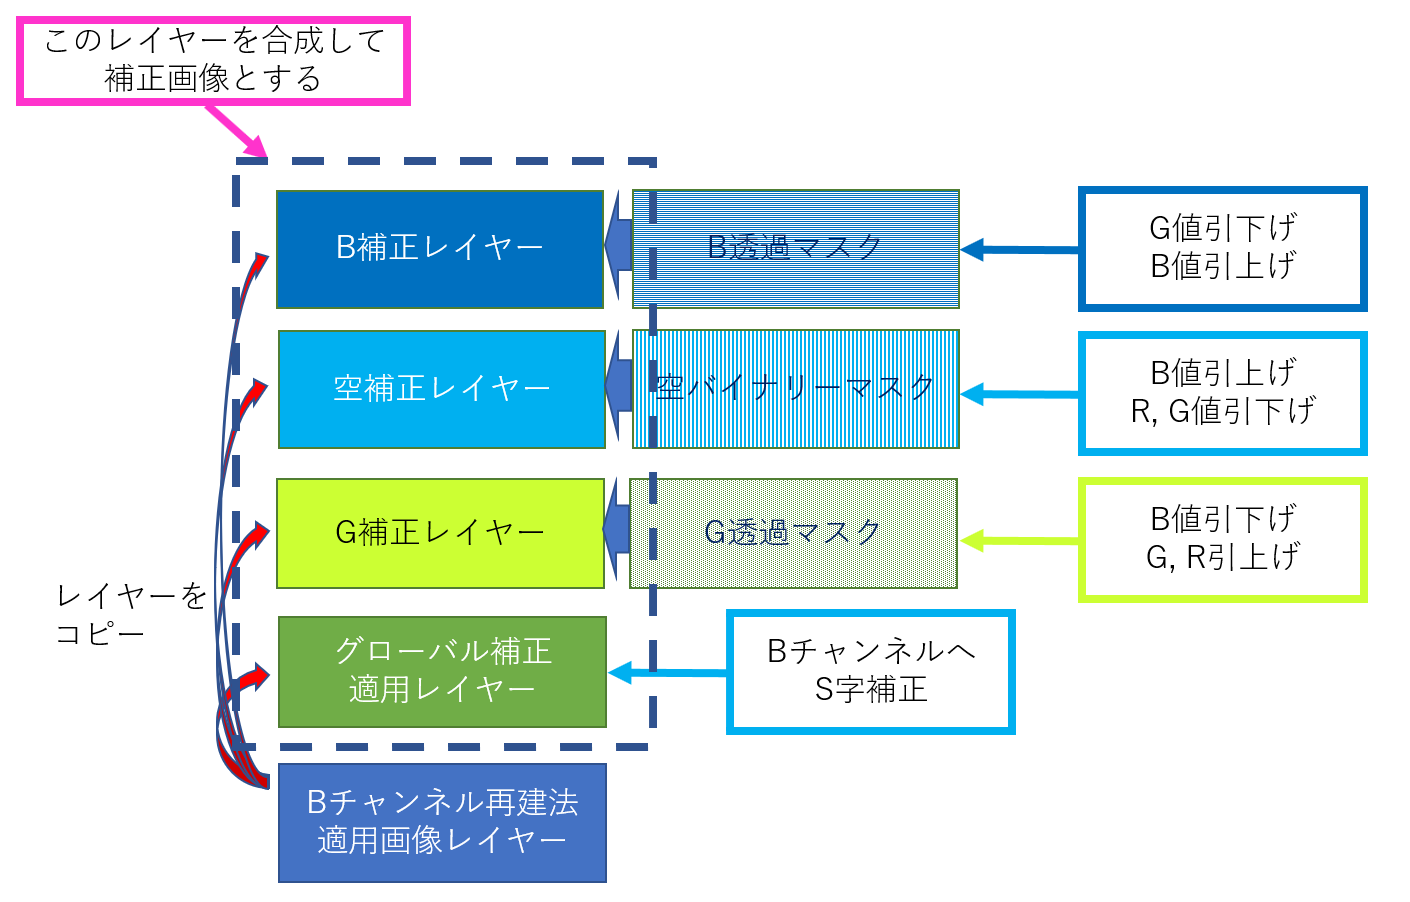 f:id:yasuo_ssi:20210616214006p:plain